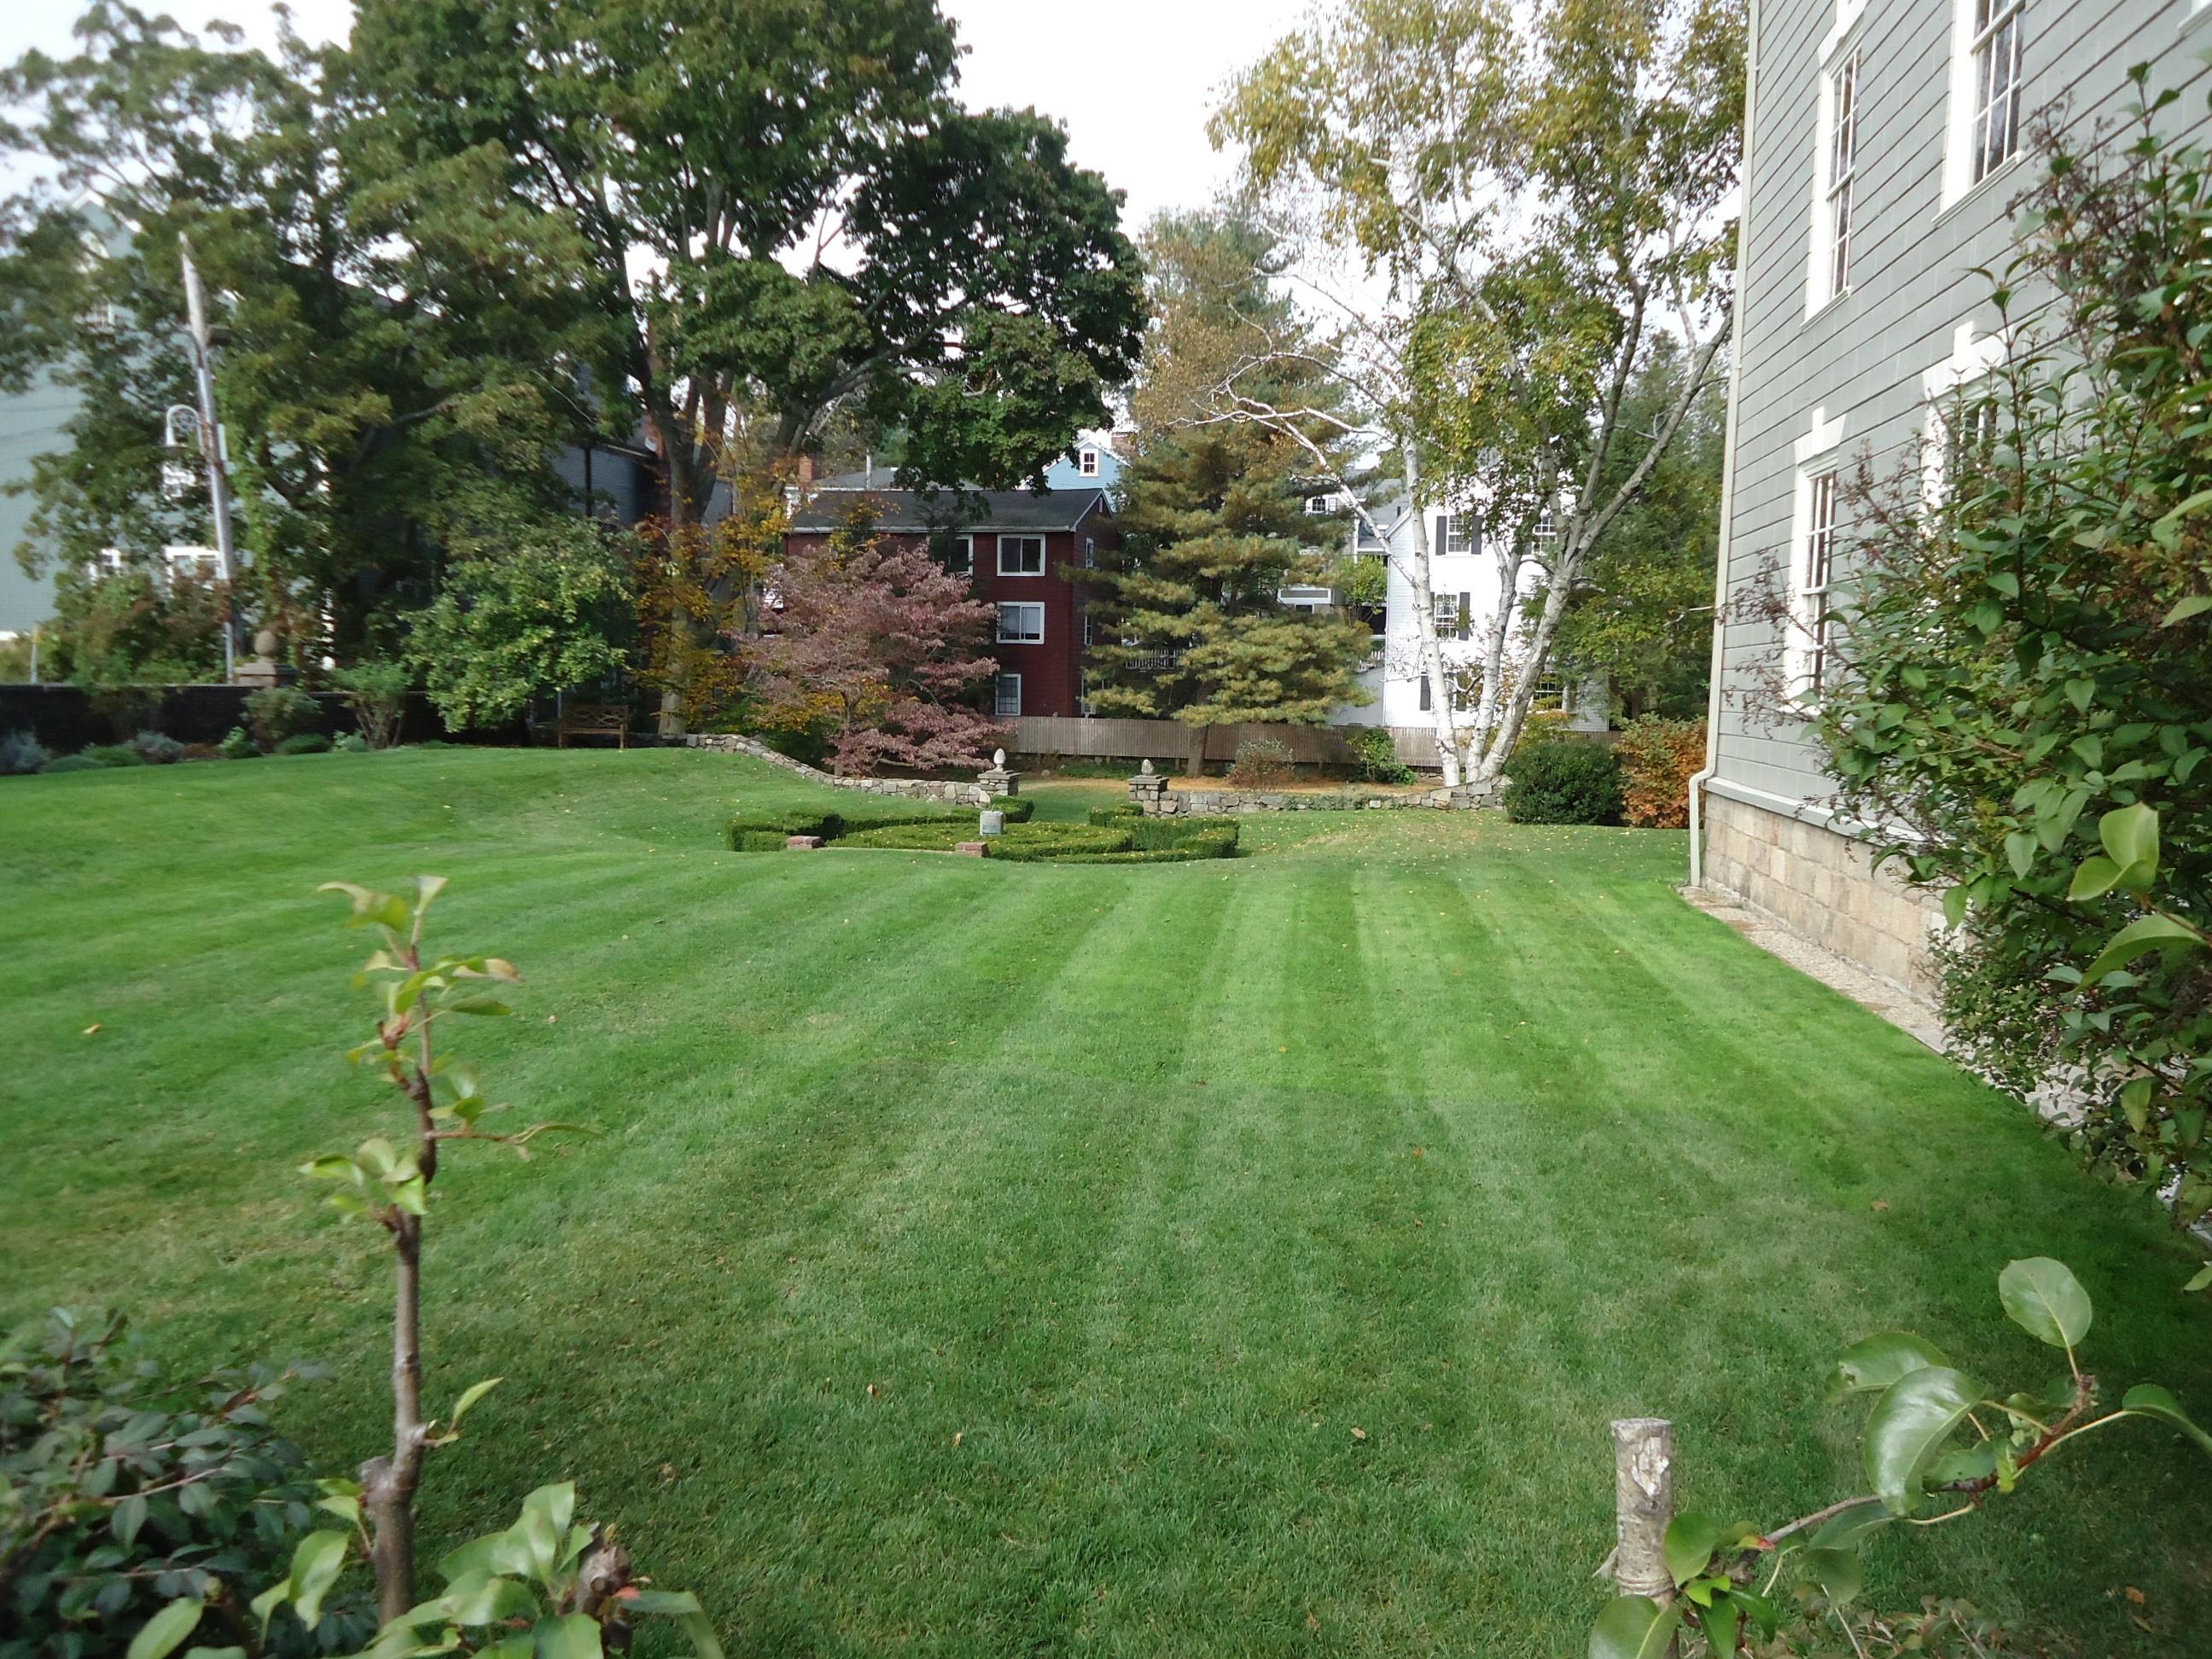 File:Marblehead Massachusetts Garden Behind Historical Society Building.JPG